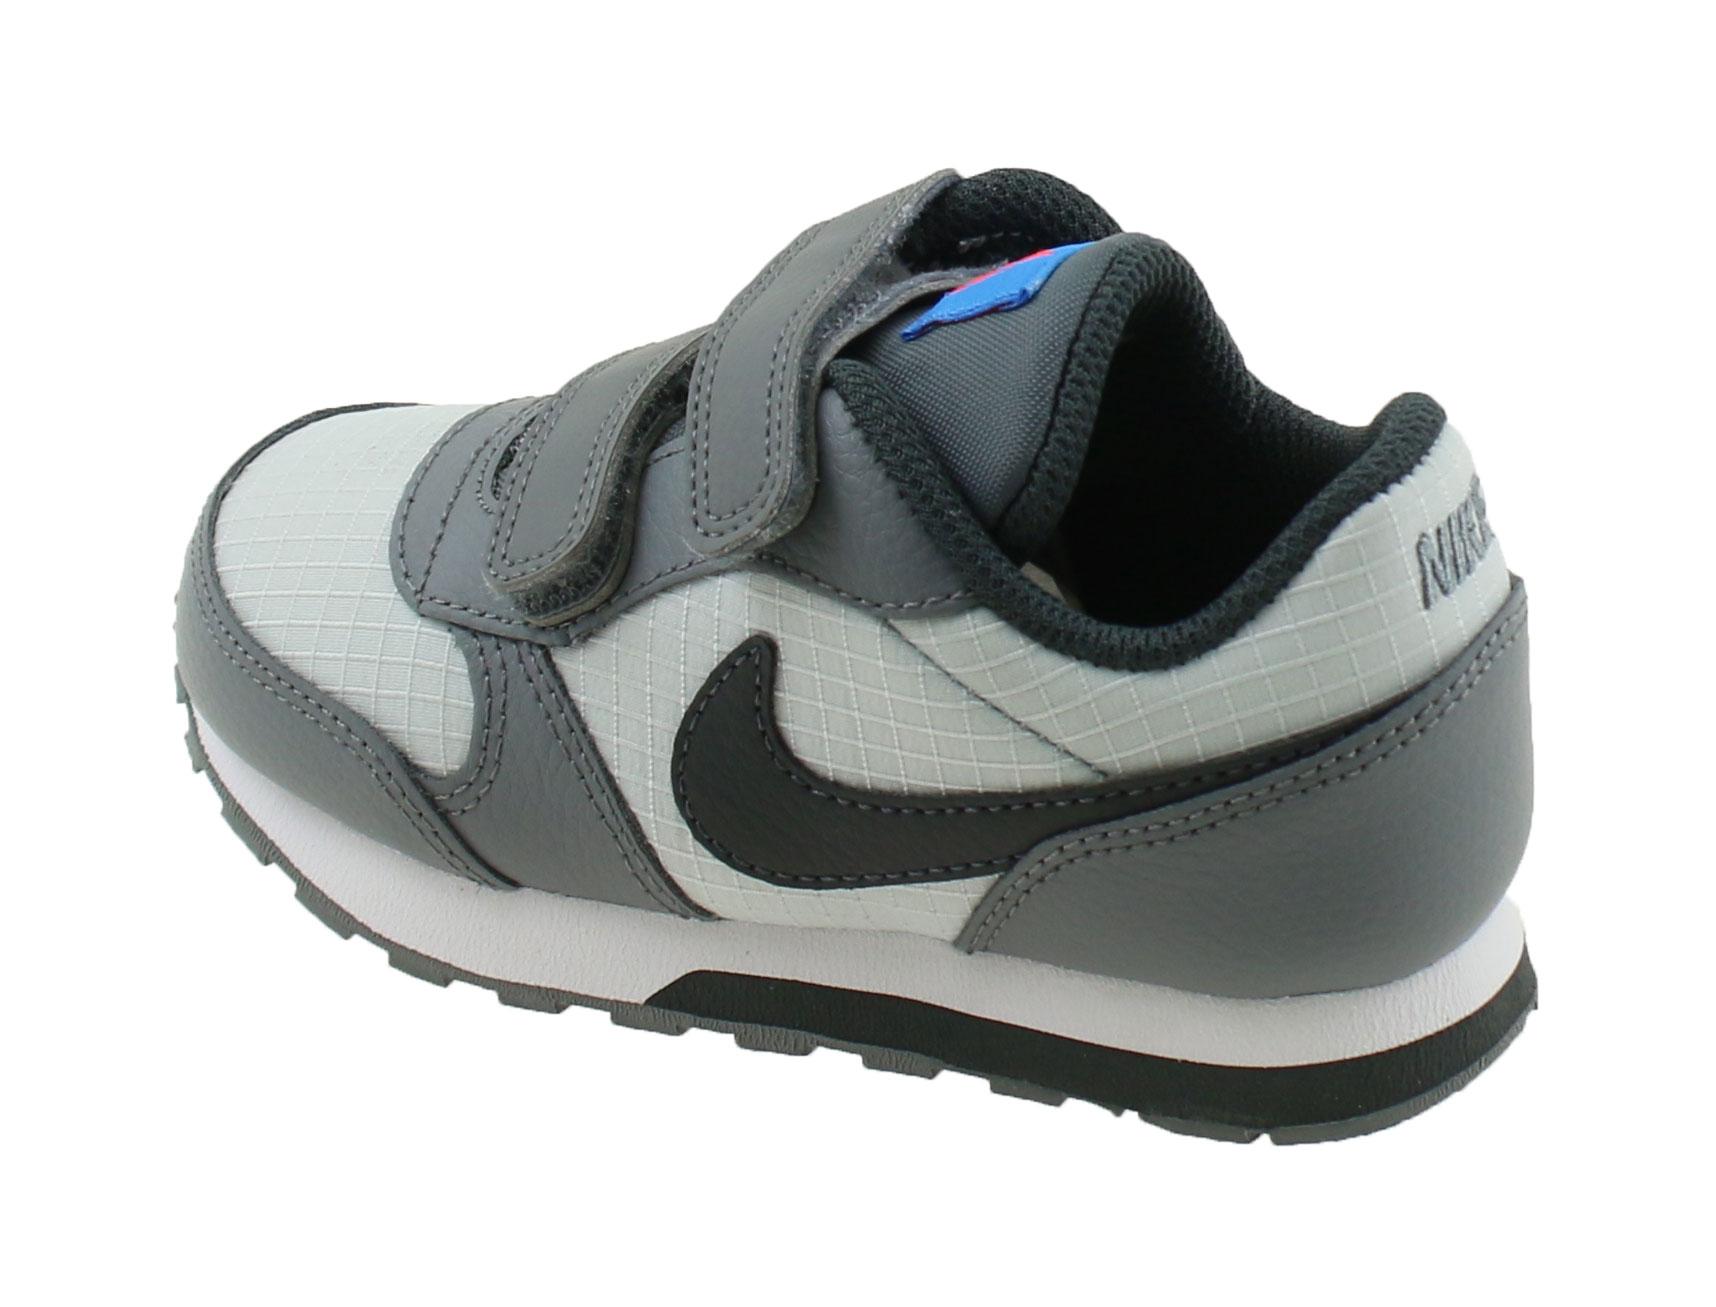 super popular d7c04 f4c30 Nike MD Runner 2 (TD) Peuter. 806255 015 Pure Platinum Anthracite. Product  afbeelding Product afbeelding Product afbeelding Product afbeelding